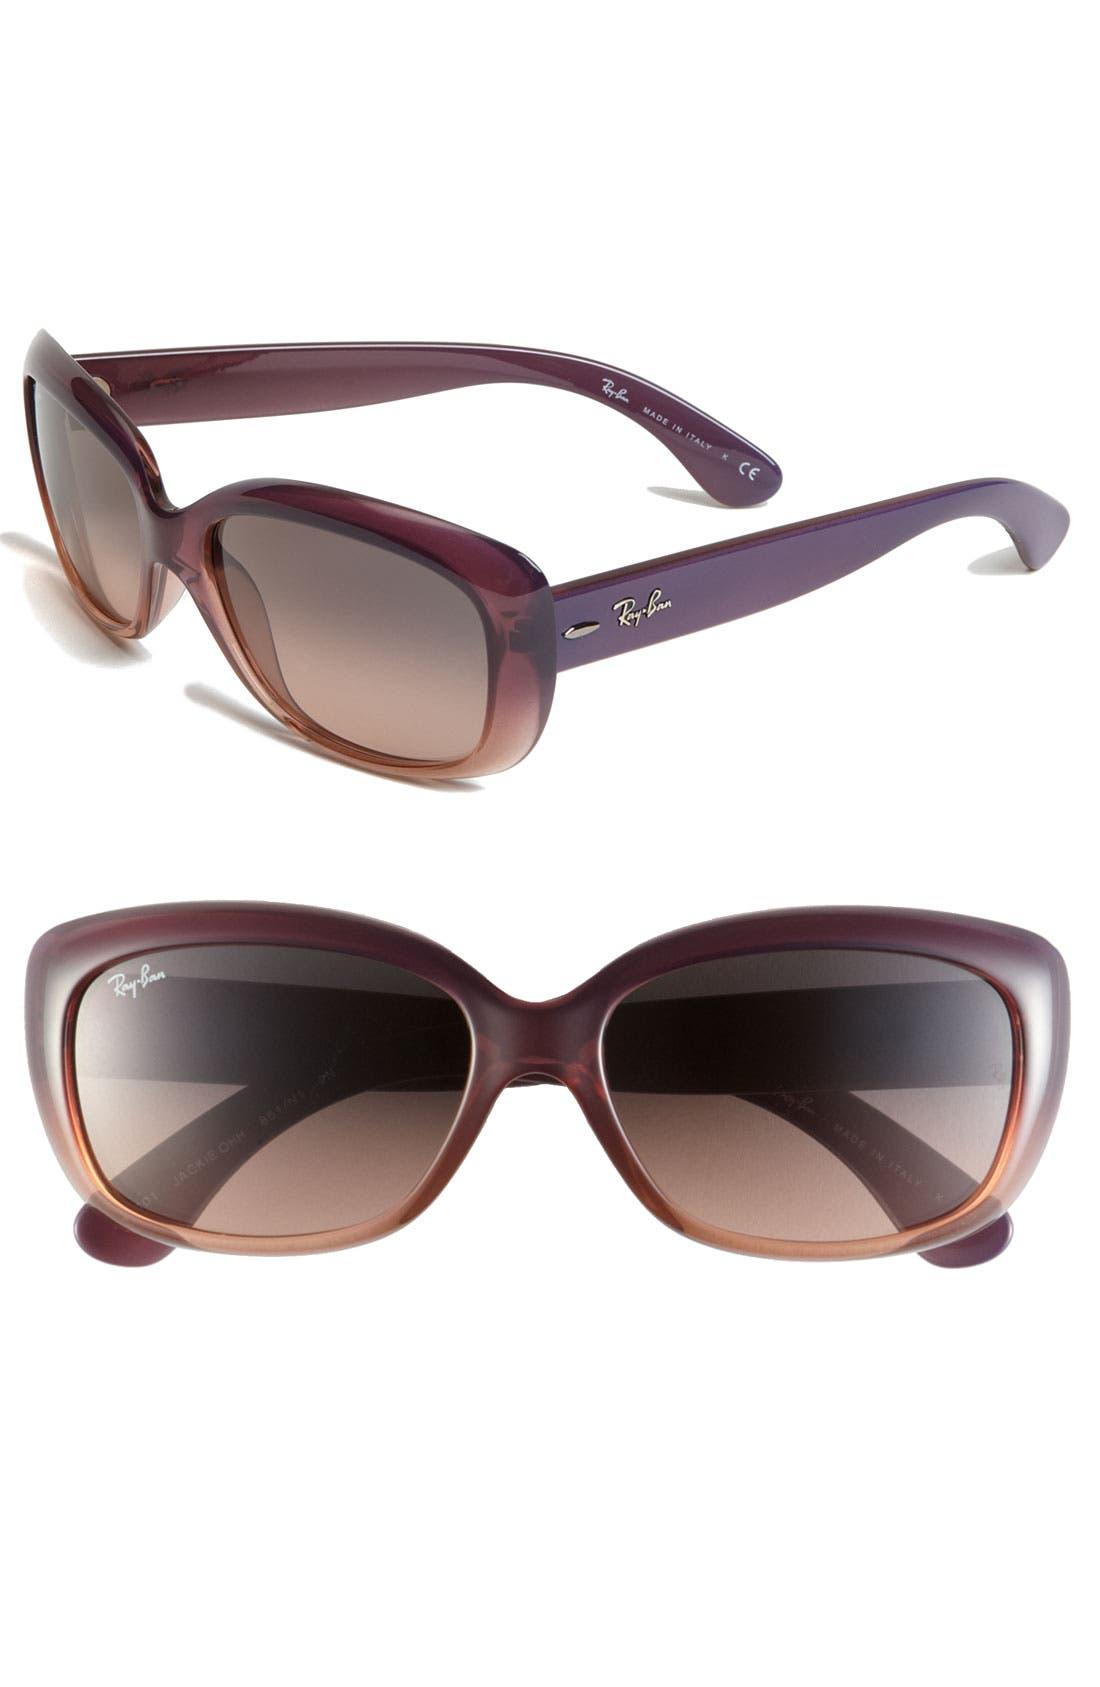 Main Image - Ray-Ban 'Classic' 58mm Sunglasses